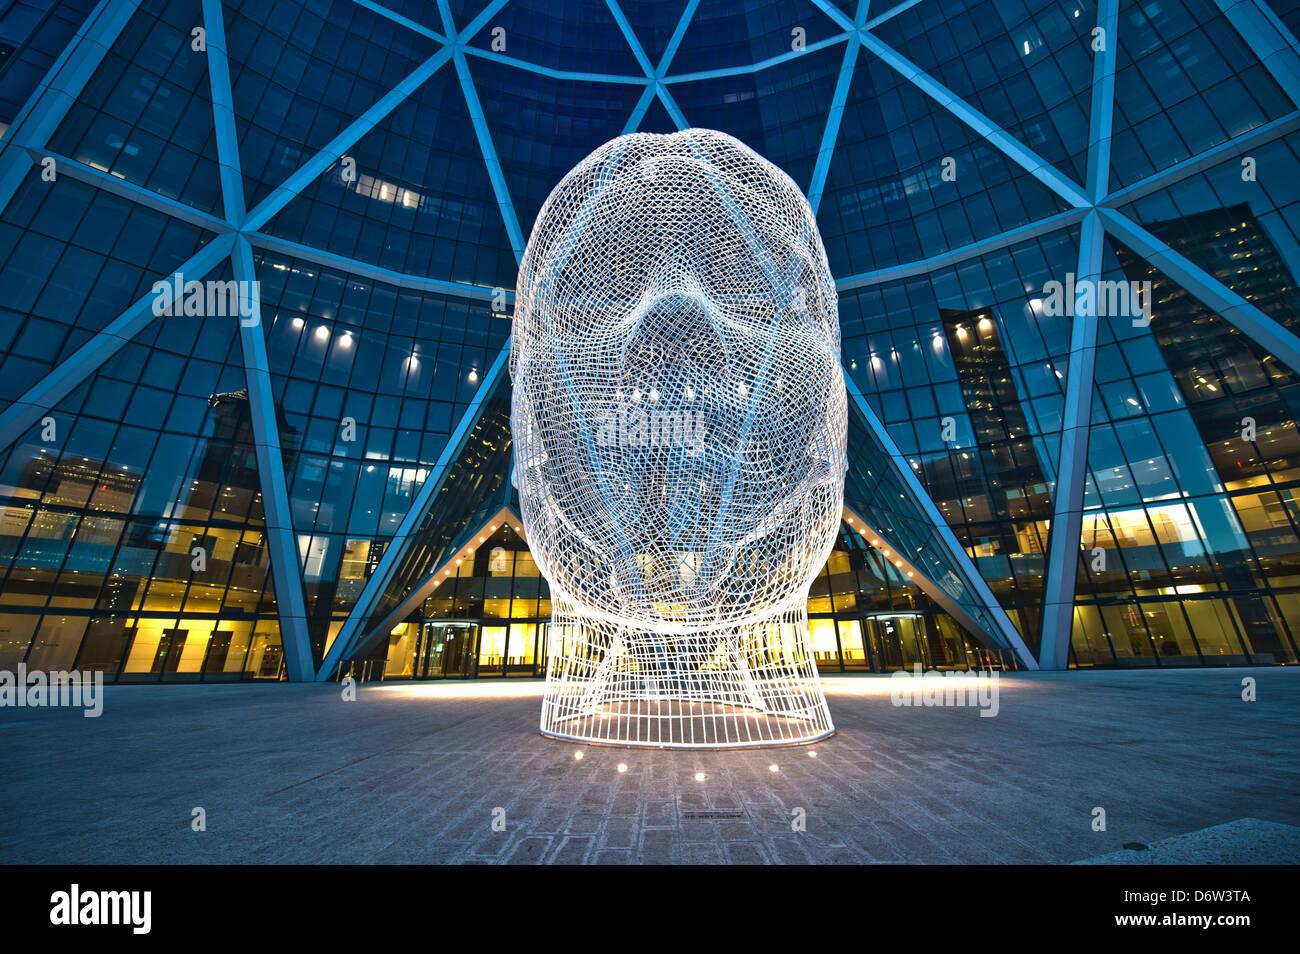 Jaume Plensa Wonderland Sculpture Calgary Alberta Canada Stock ...